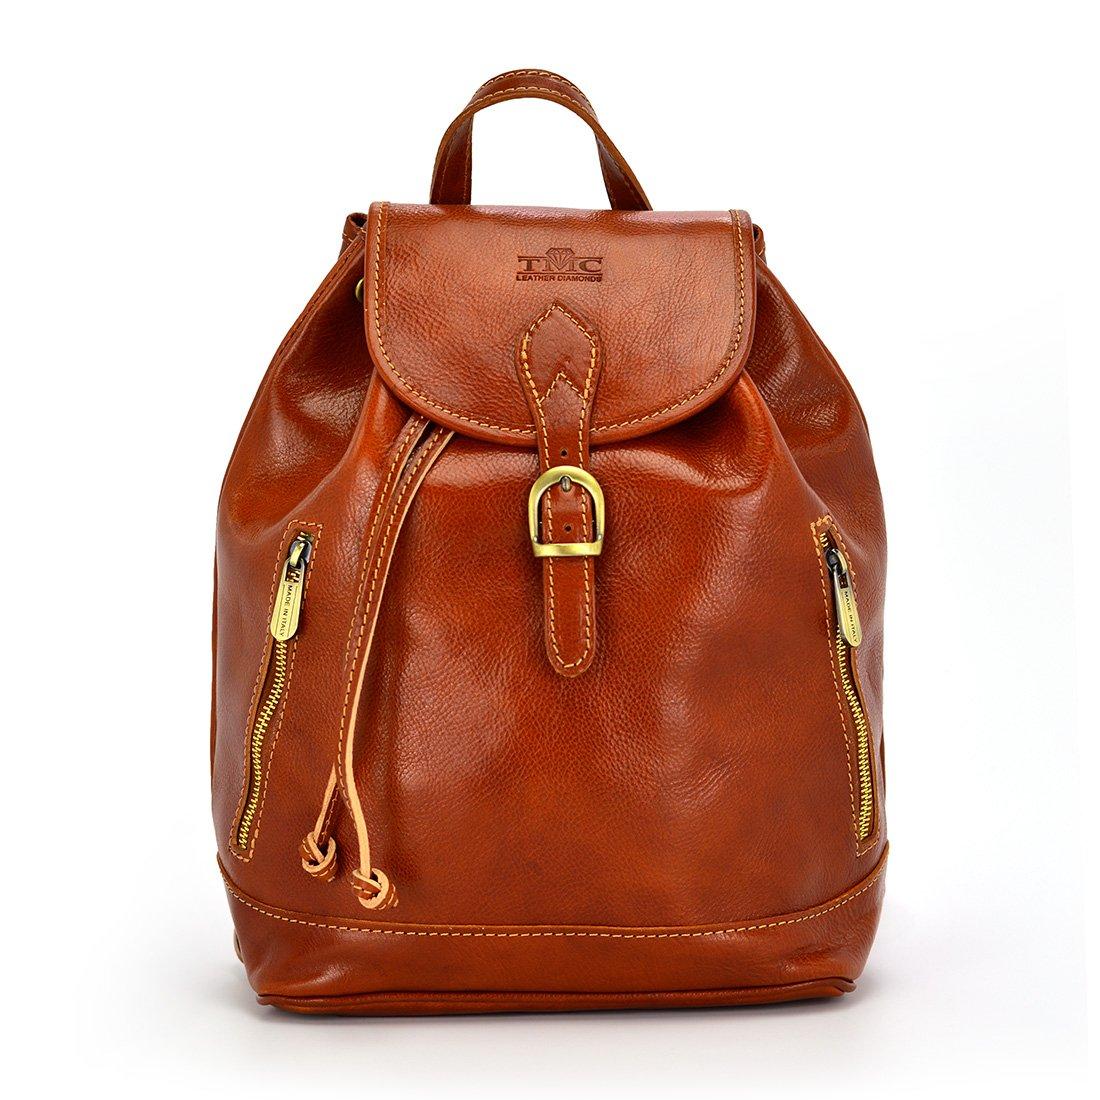 3c7fb02e1fa5f Torebka-plecak vp422c Camel - Miękka cielęca skóra   Camel - Kup teraz  Online